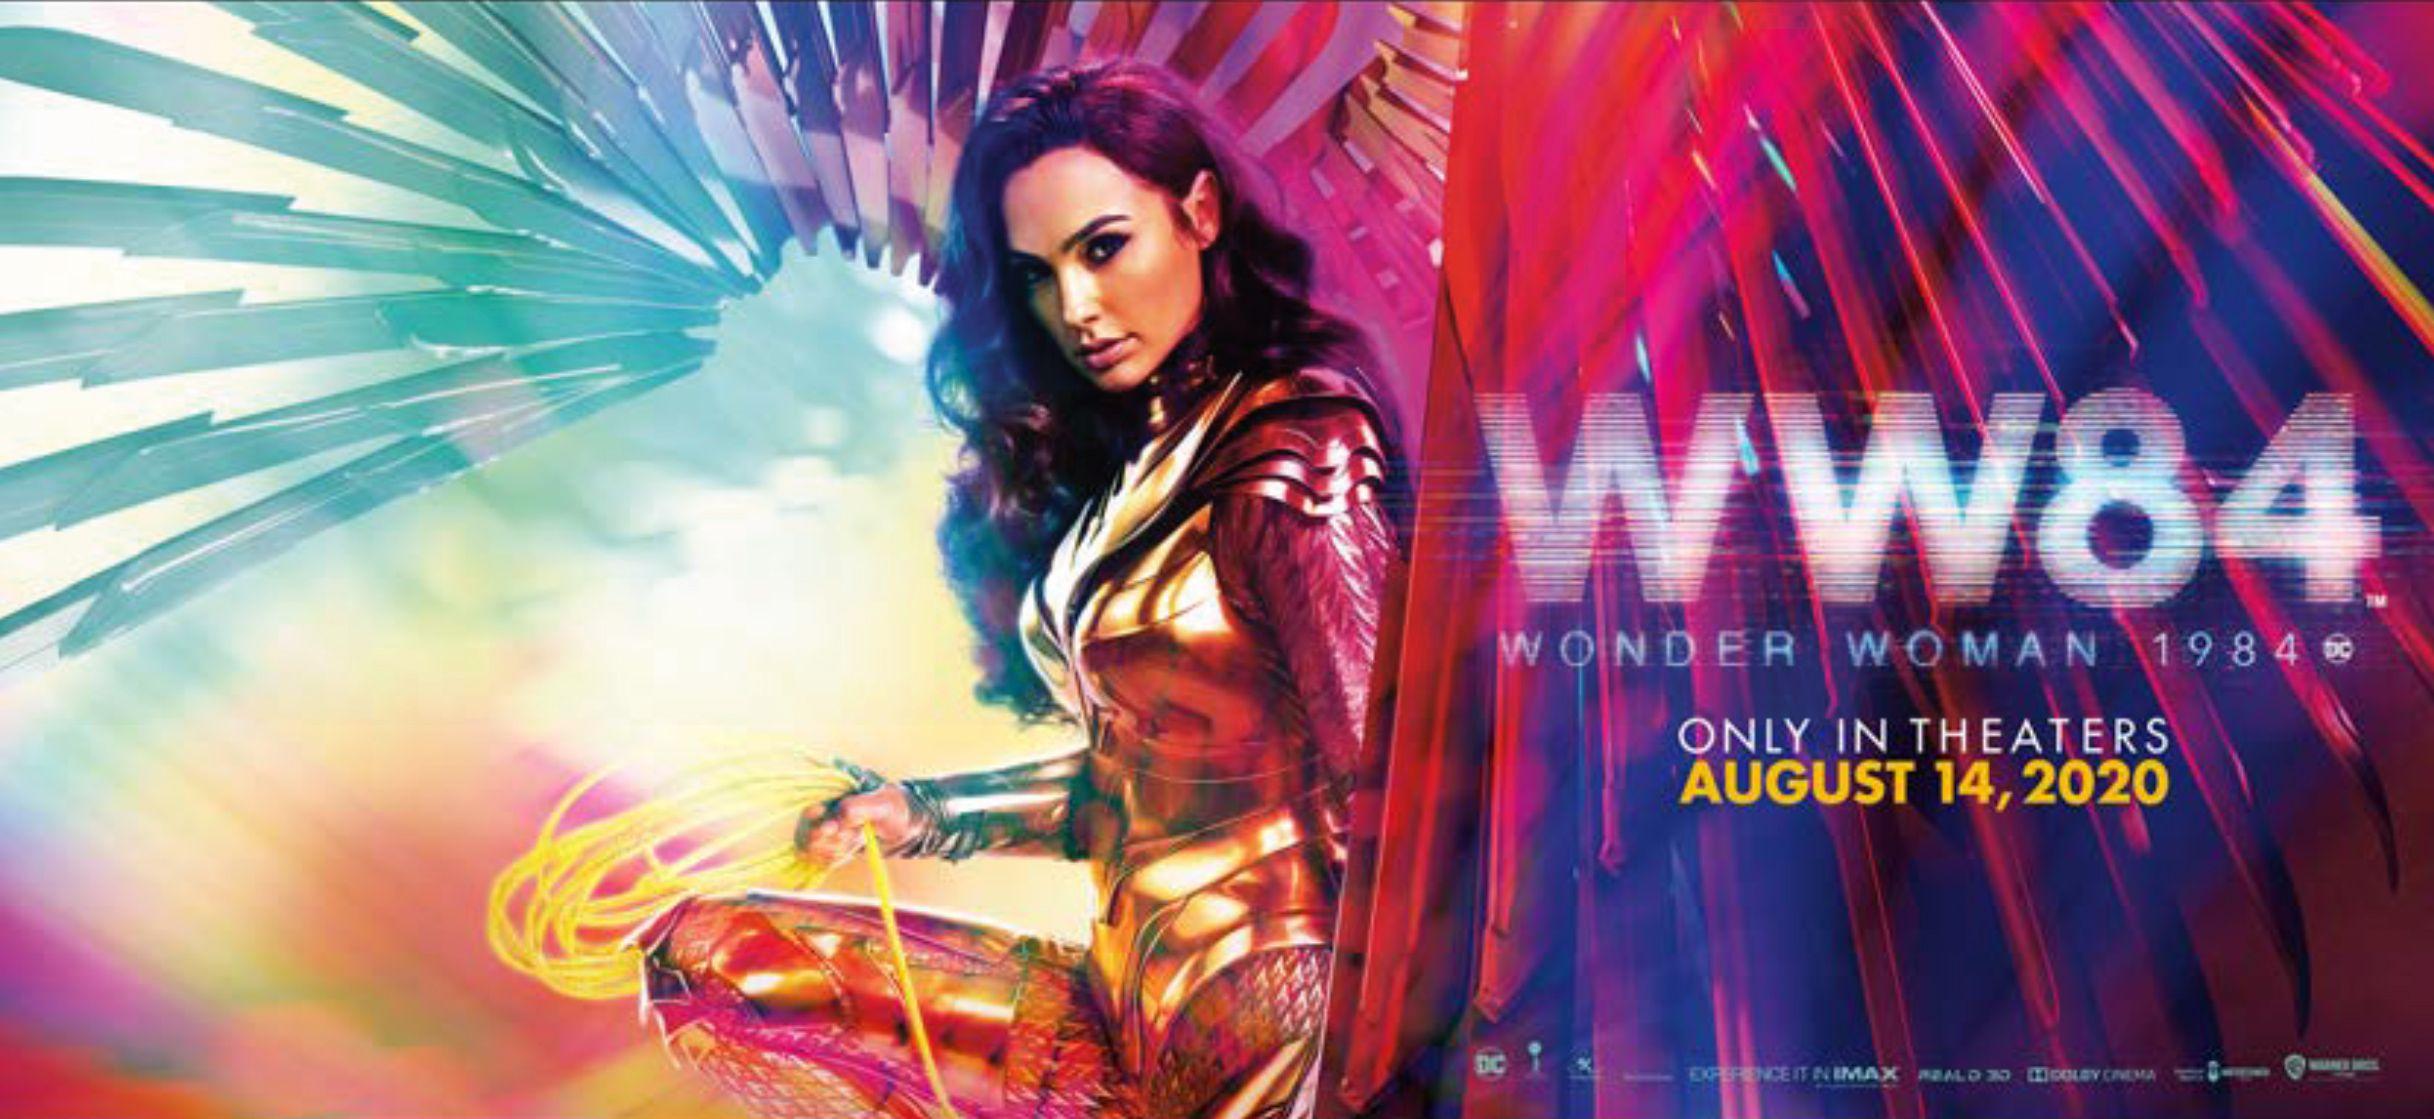 Pin By Rpf Media On Wonder Woman 1984 In 2020 Wonder Woman Movie Wonder Woman Movie Photo